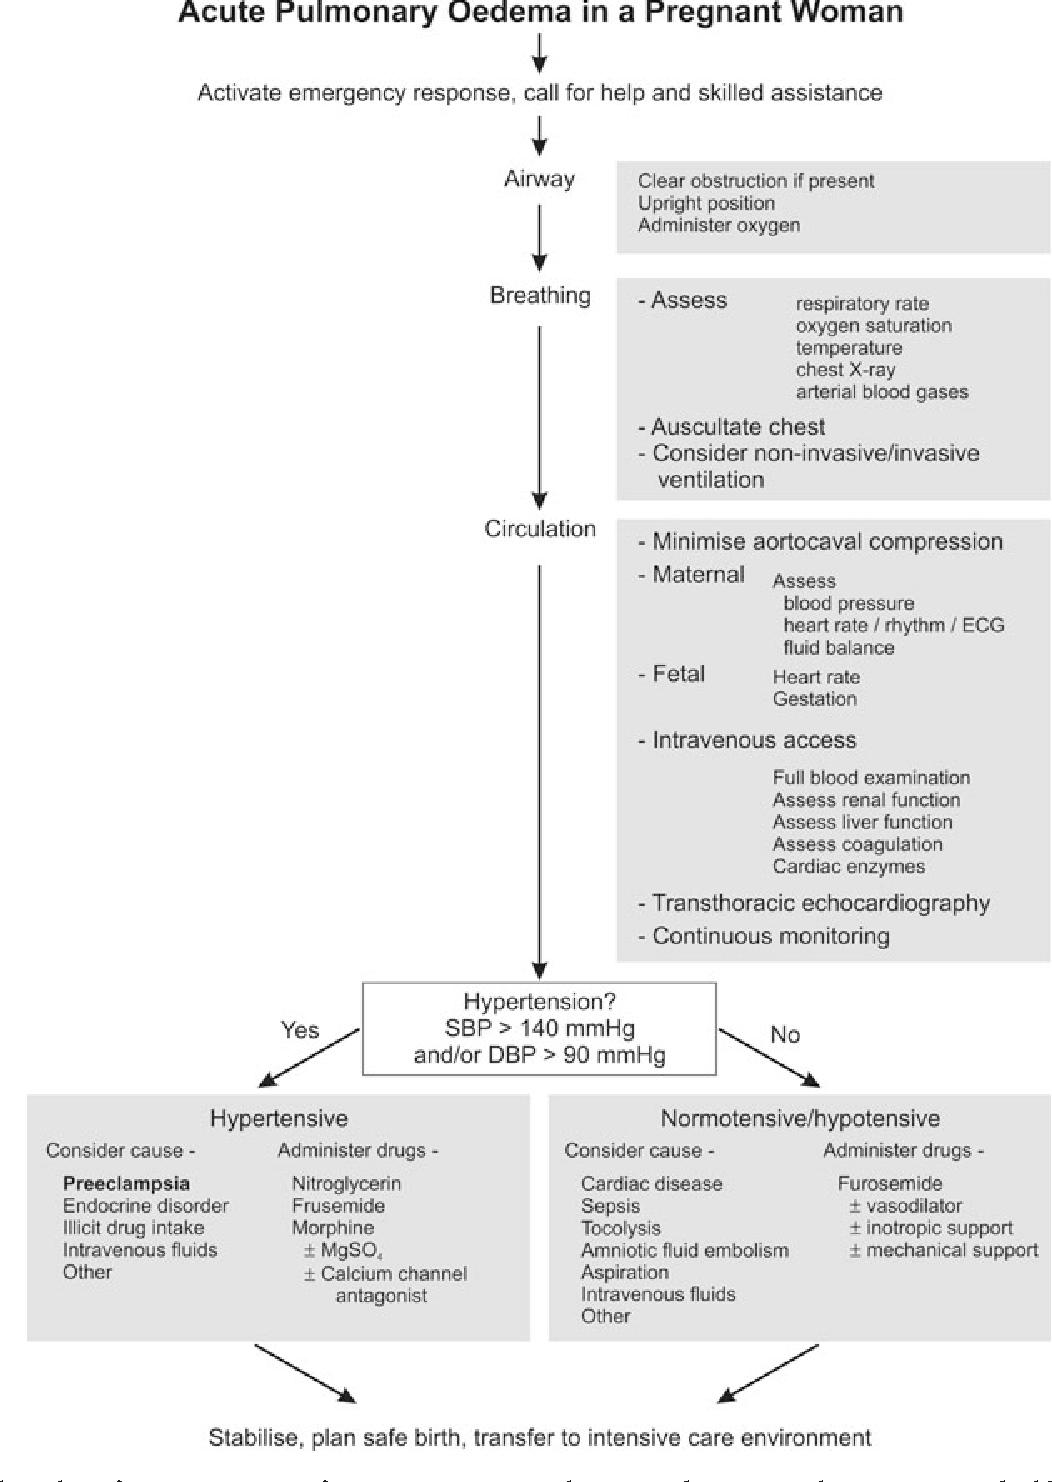 Figure 3 From Acute Pulmonary Oedema In Pregnant Women Semantic